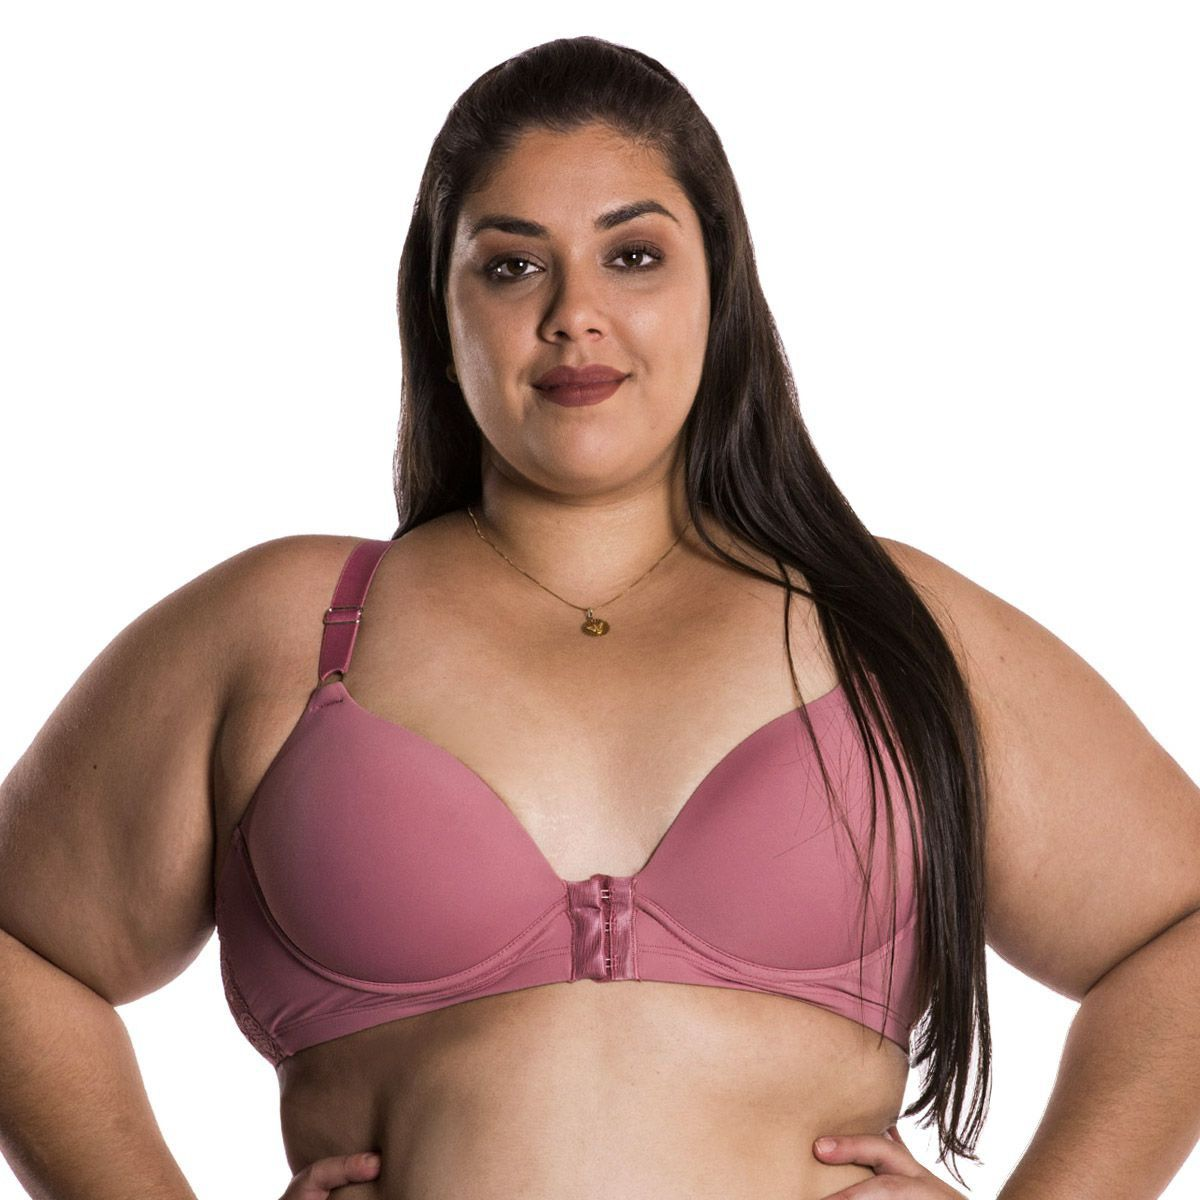 Sutiã Plus Size Nadador Rendado Fecho Frontal Nayane Rodrigues